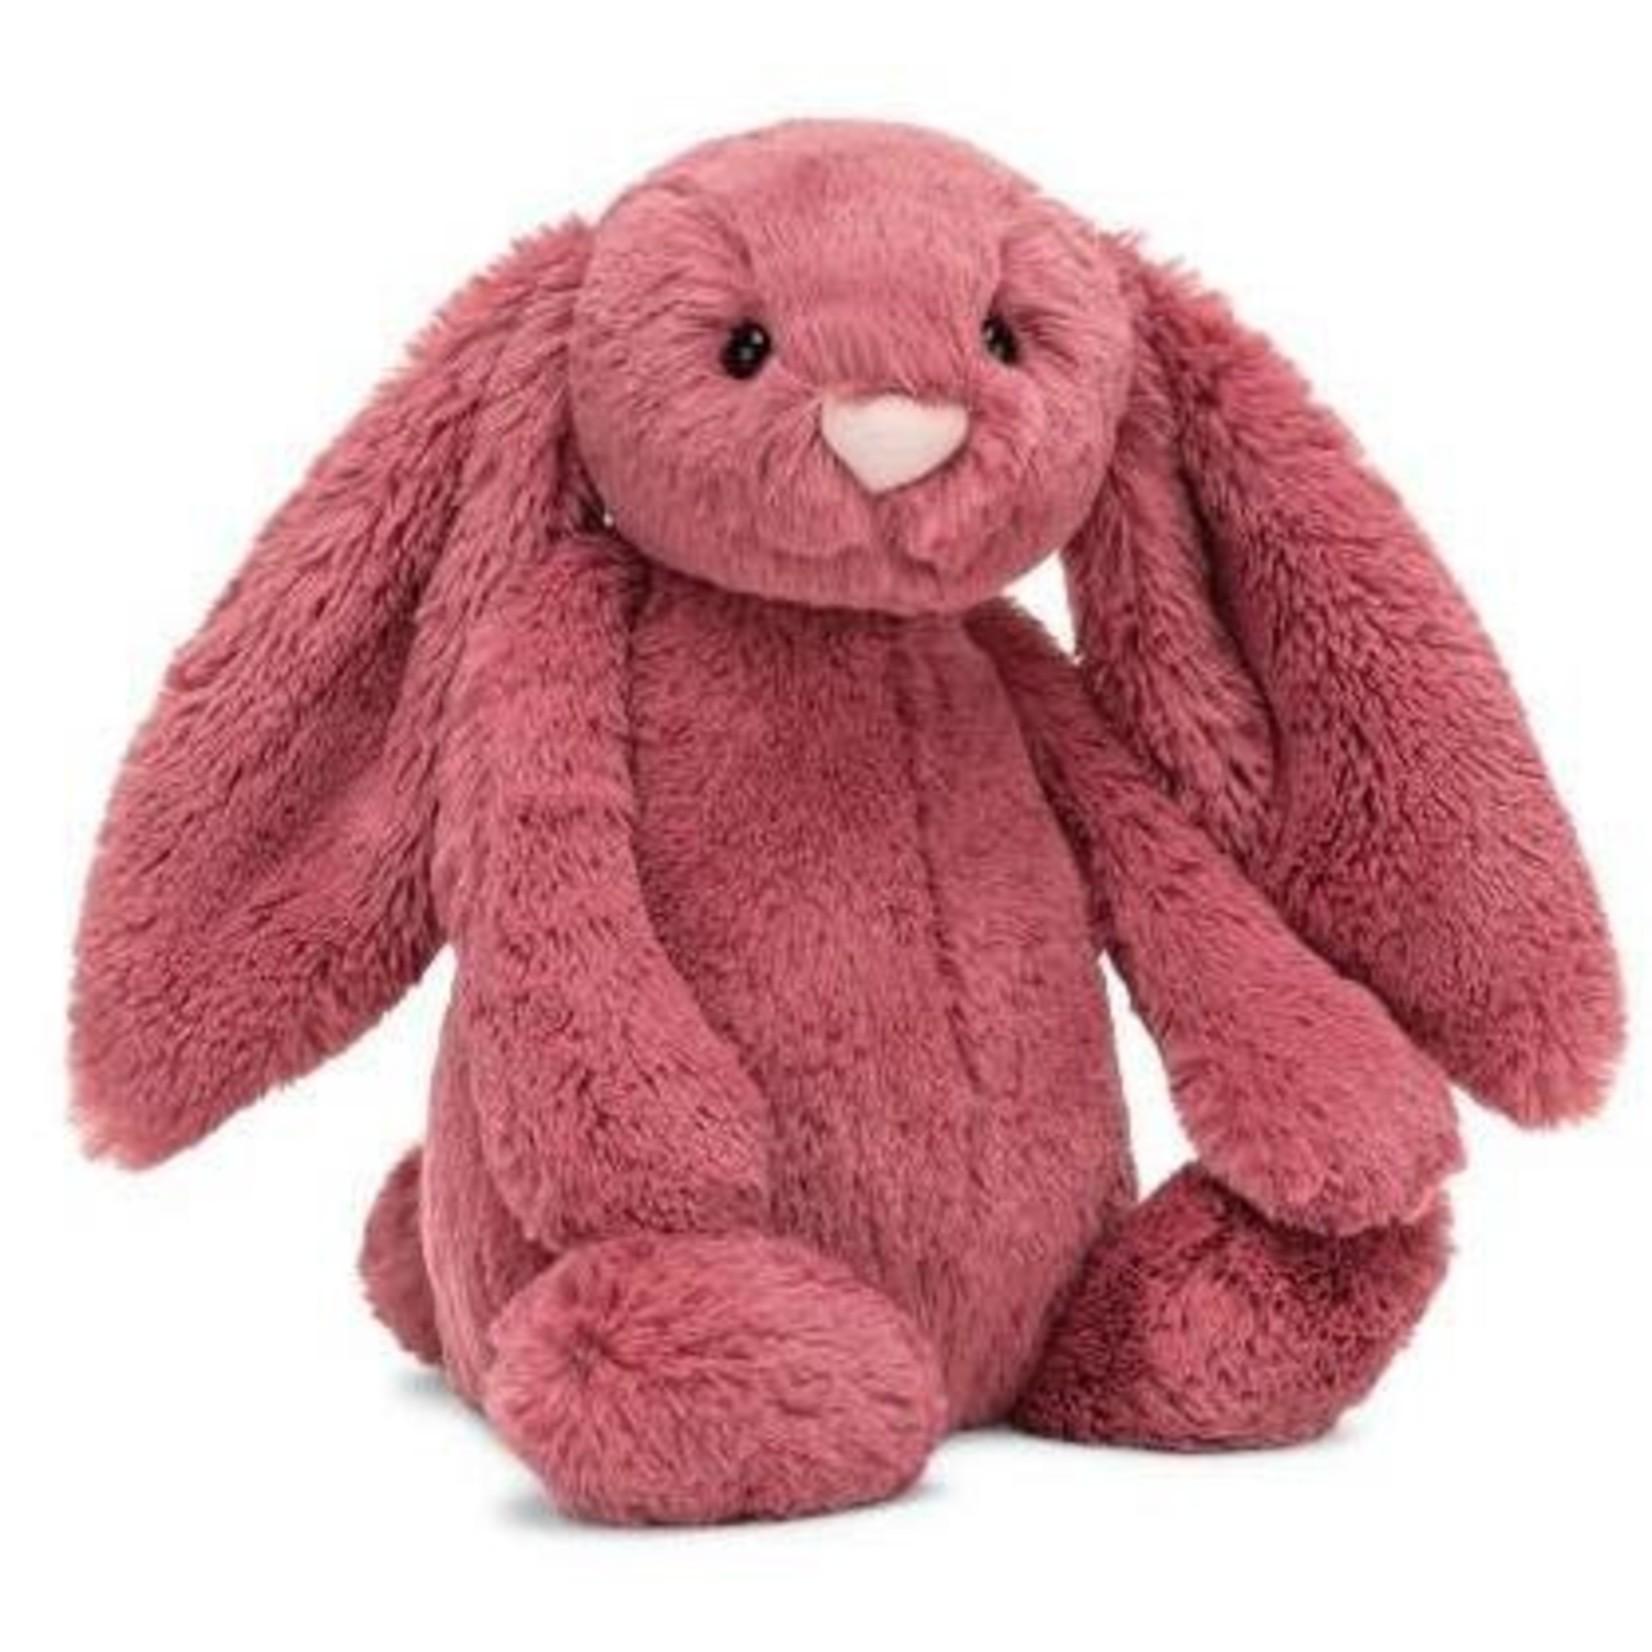 Jellycat Bashful Dusty Pink Bunny